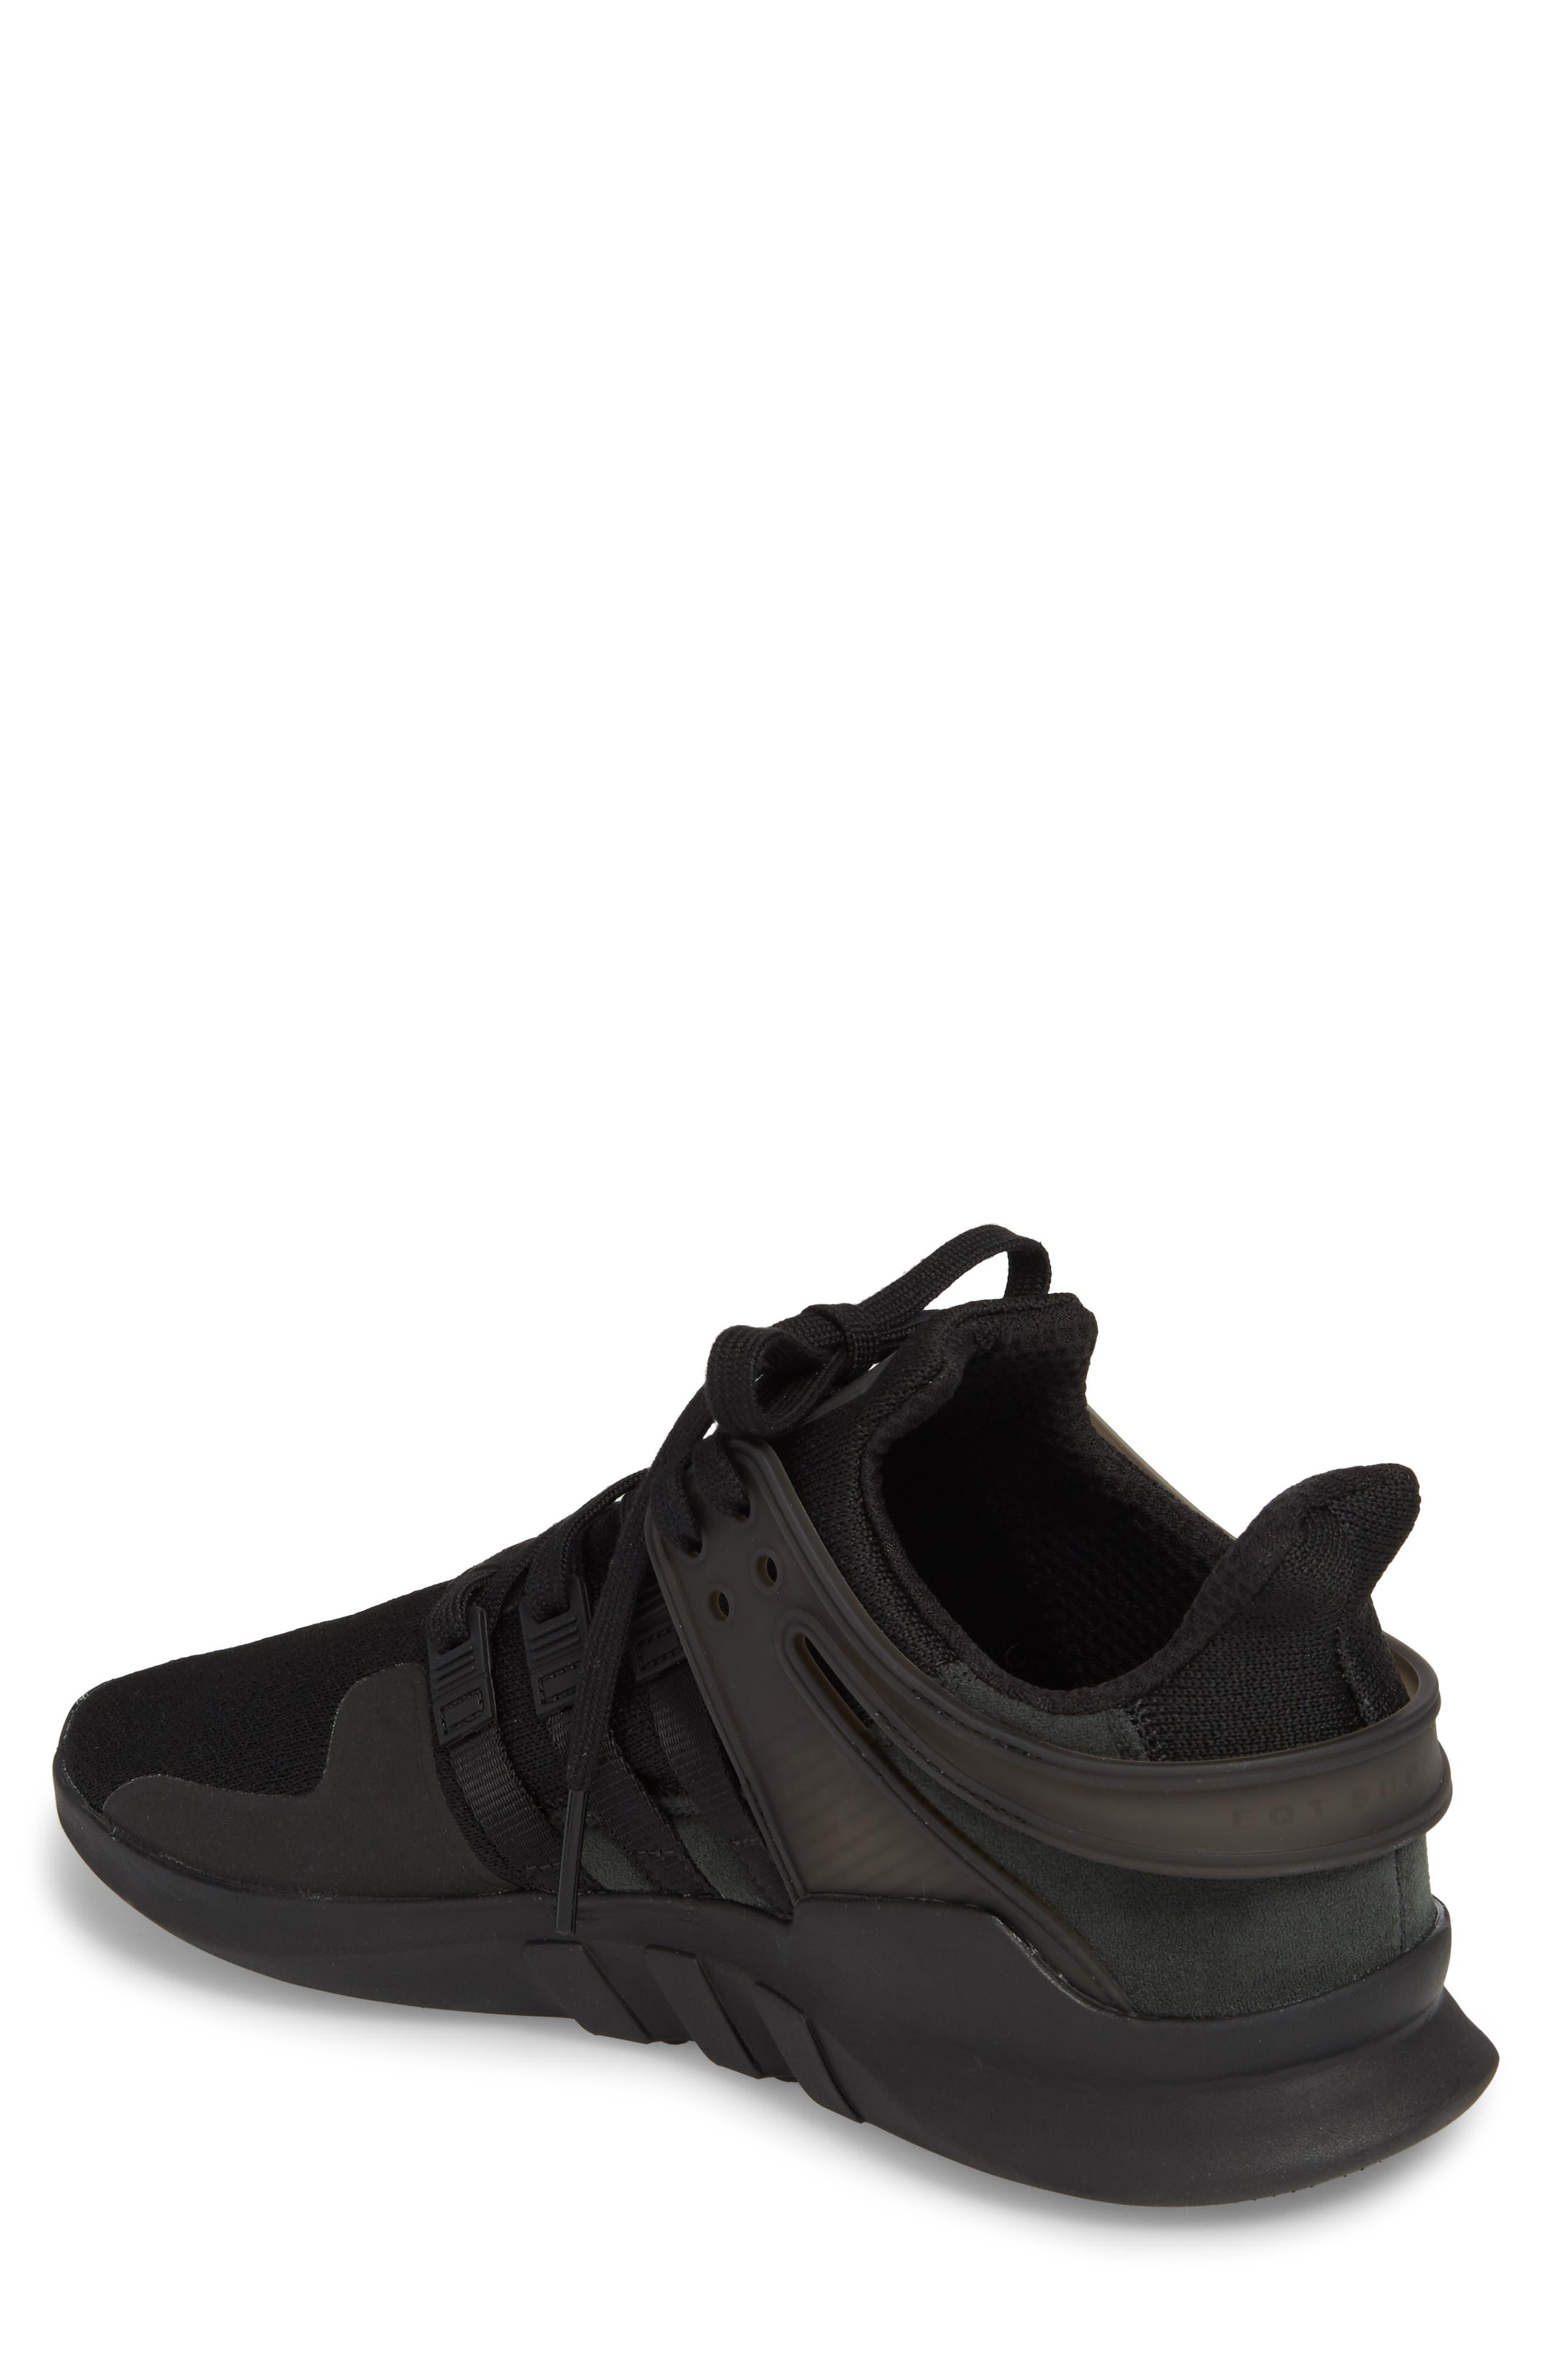 EQT Support Adv Sneaker,                             Alternate thumbnail 2, color,                             Core Black / Black / White